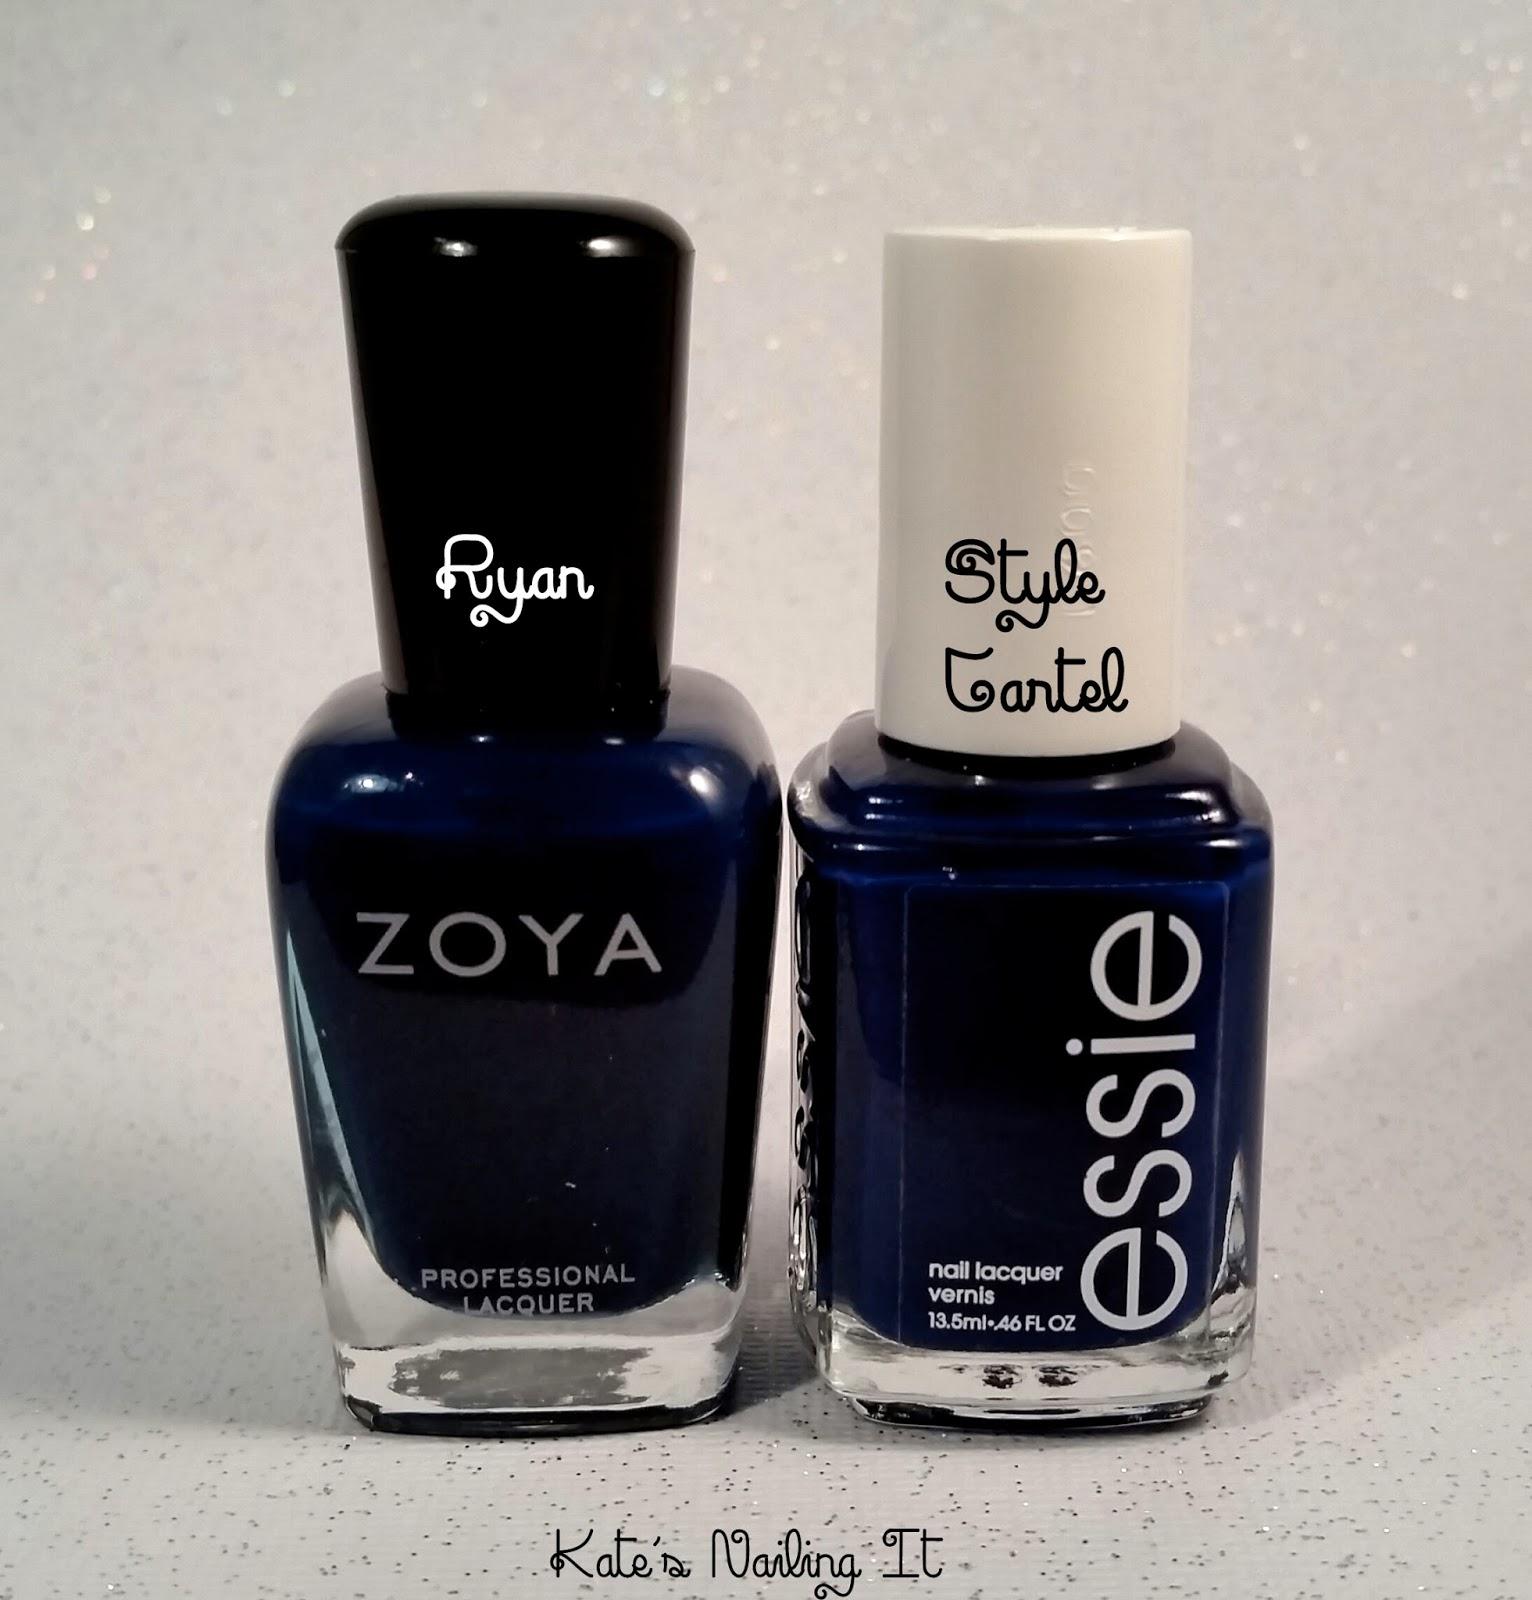 Kate\'s Nailing It: Do I Need Them All? Zoya Ryan vs Essie Style Cartel